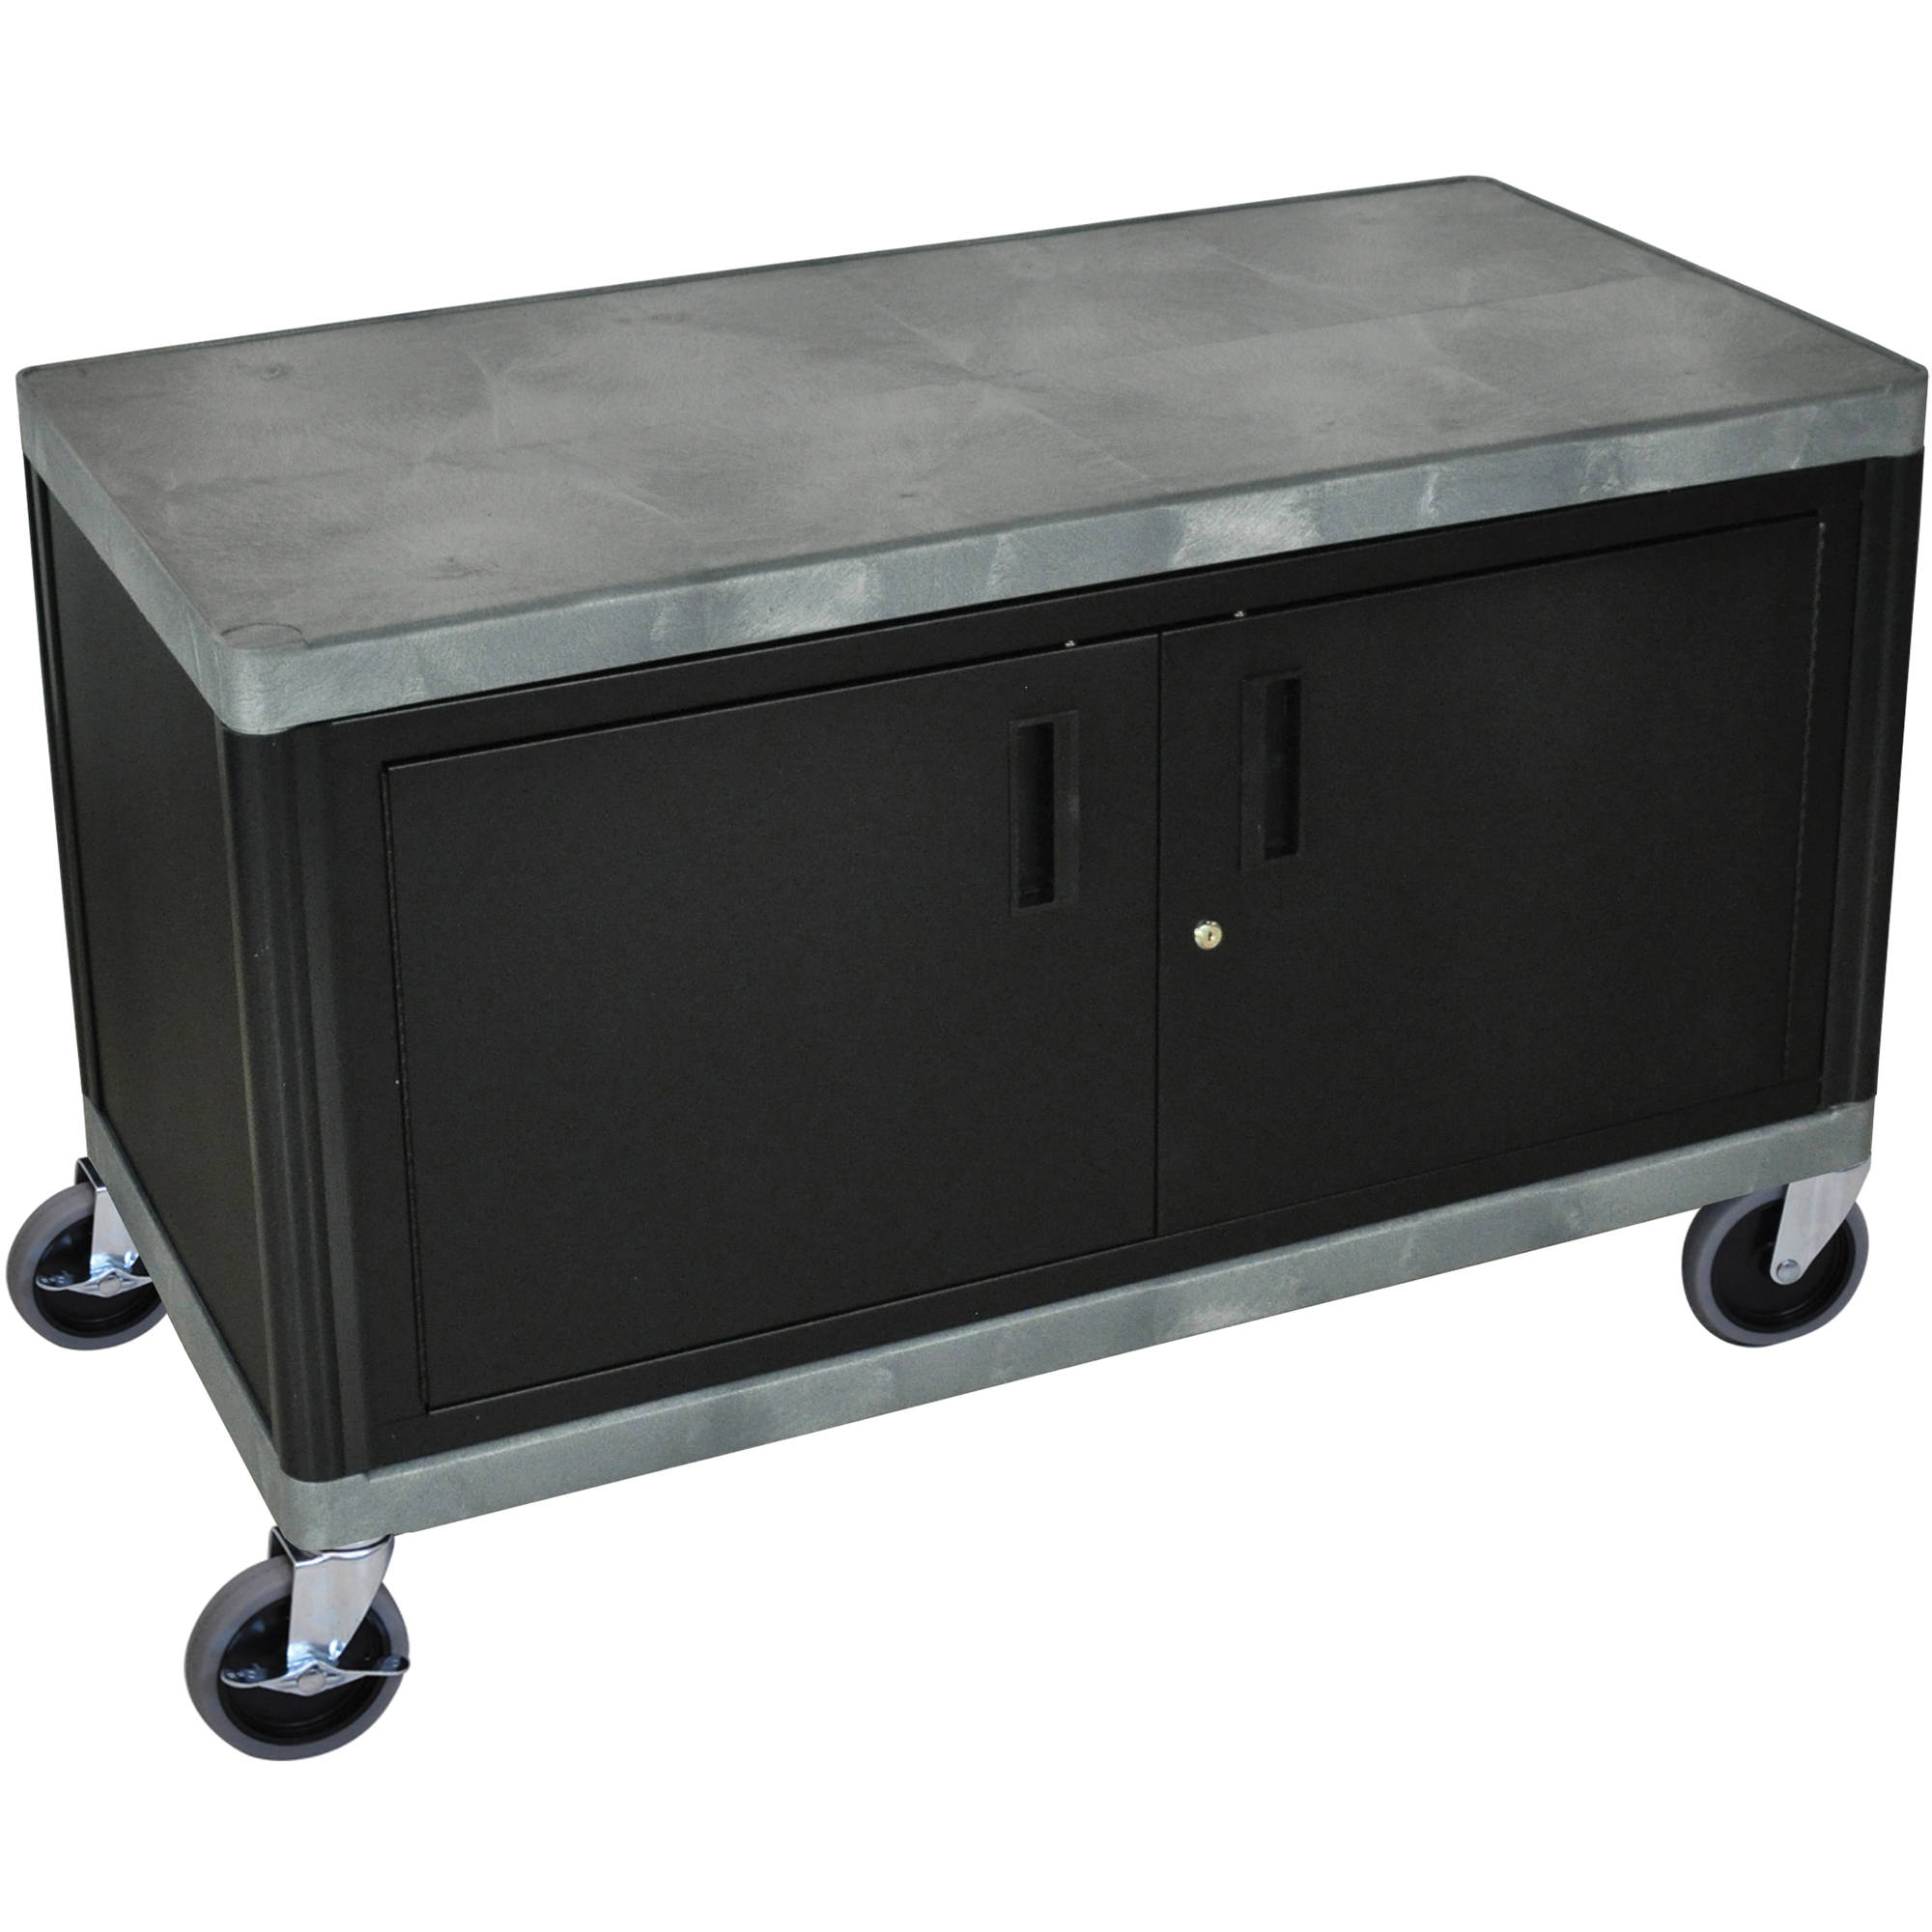 Luxor Kitchen Cabinets: Luxor HEW335C-G Industrial Cart (Cabinet, Grey) HEW335C-G B&H